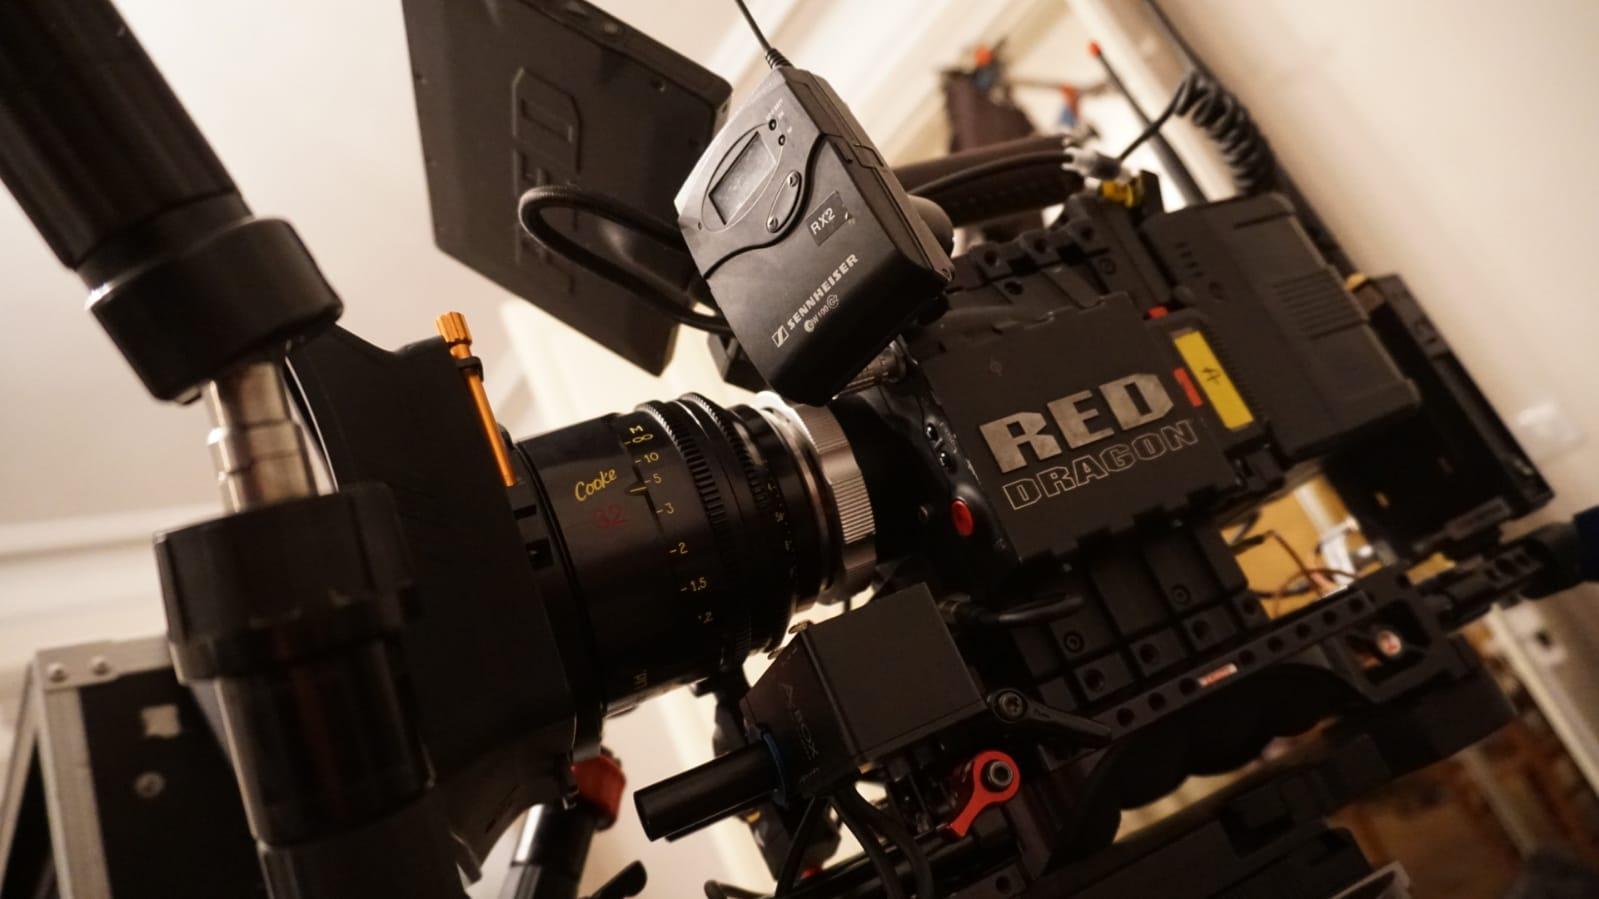 film-du-mois-leclerc-lux-camera-red